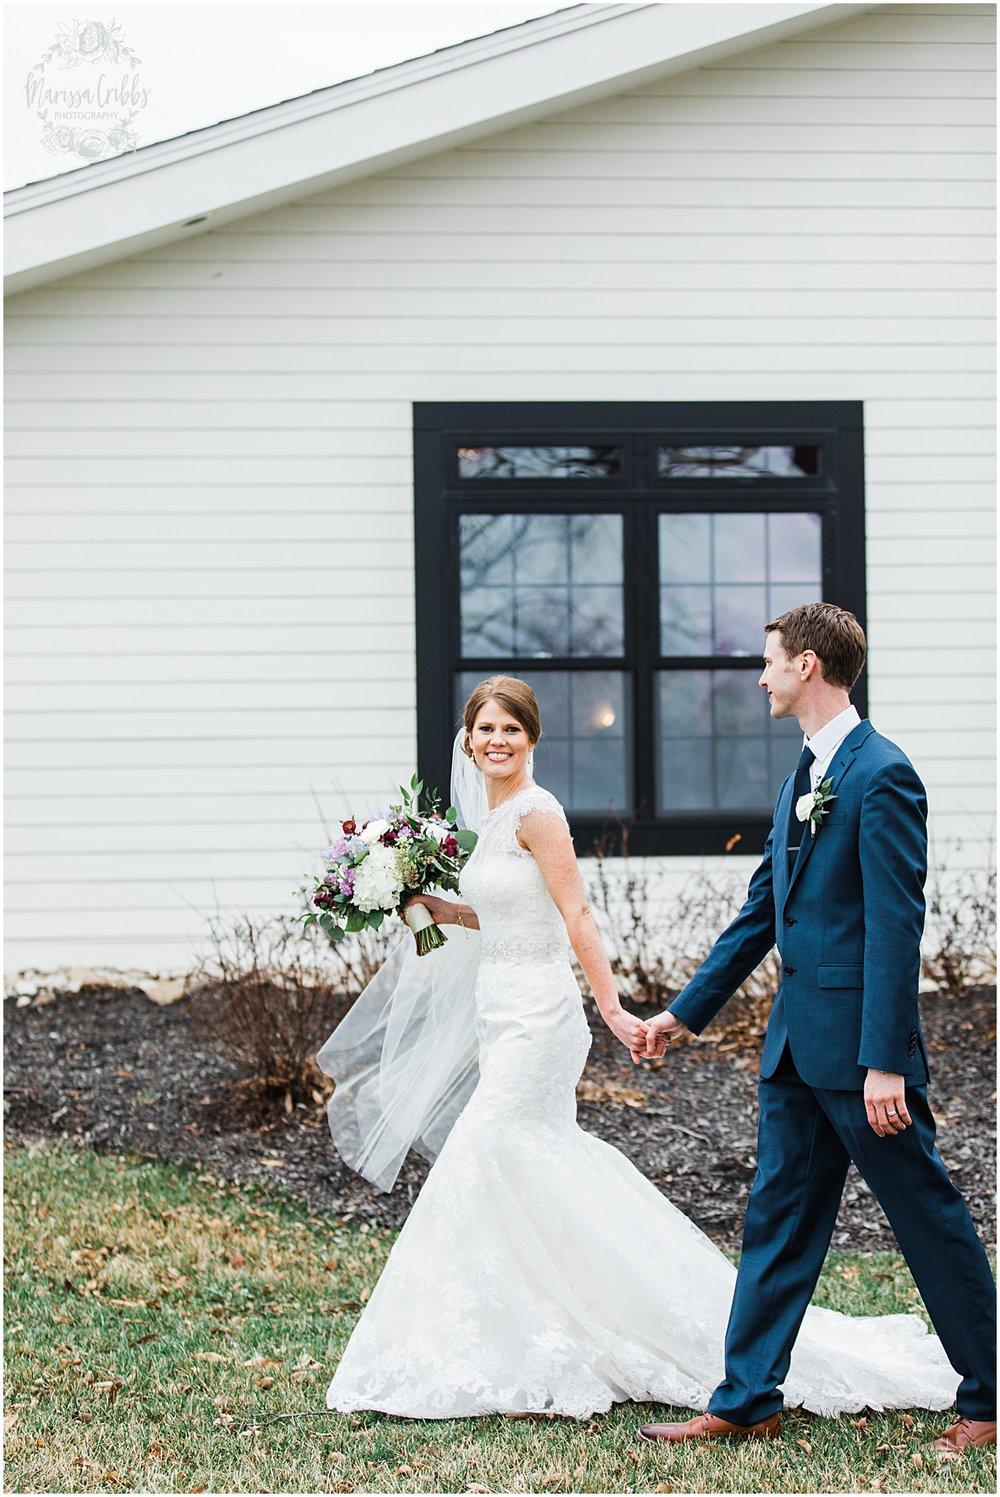 JACOBI WEDDING | 1890 EVENT SPACE | MARISSA CRIBBS PHOTOGRAPHY_4333.jpg